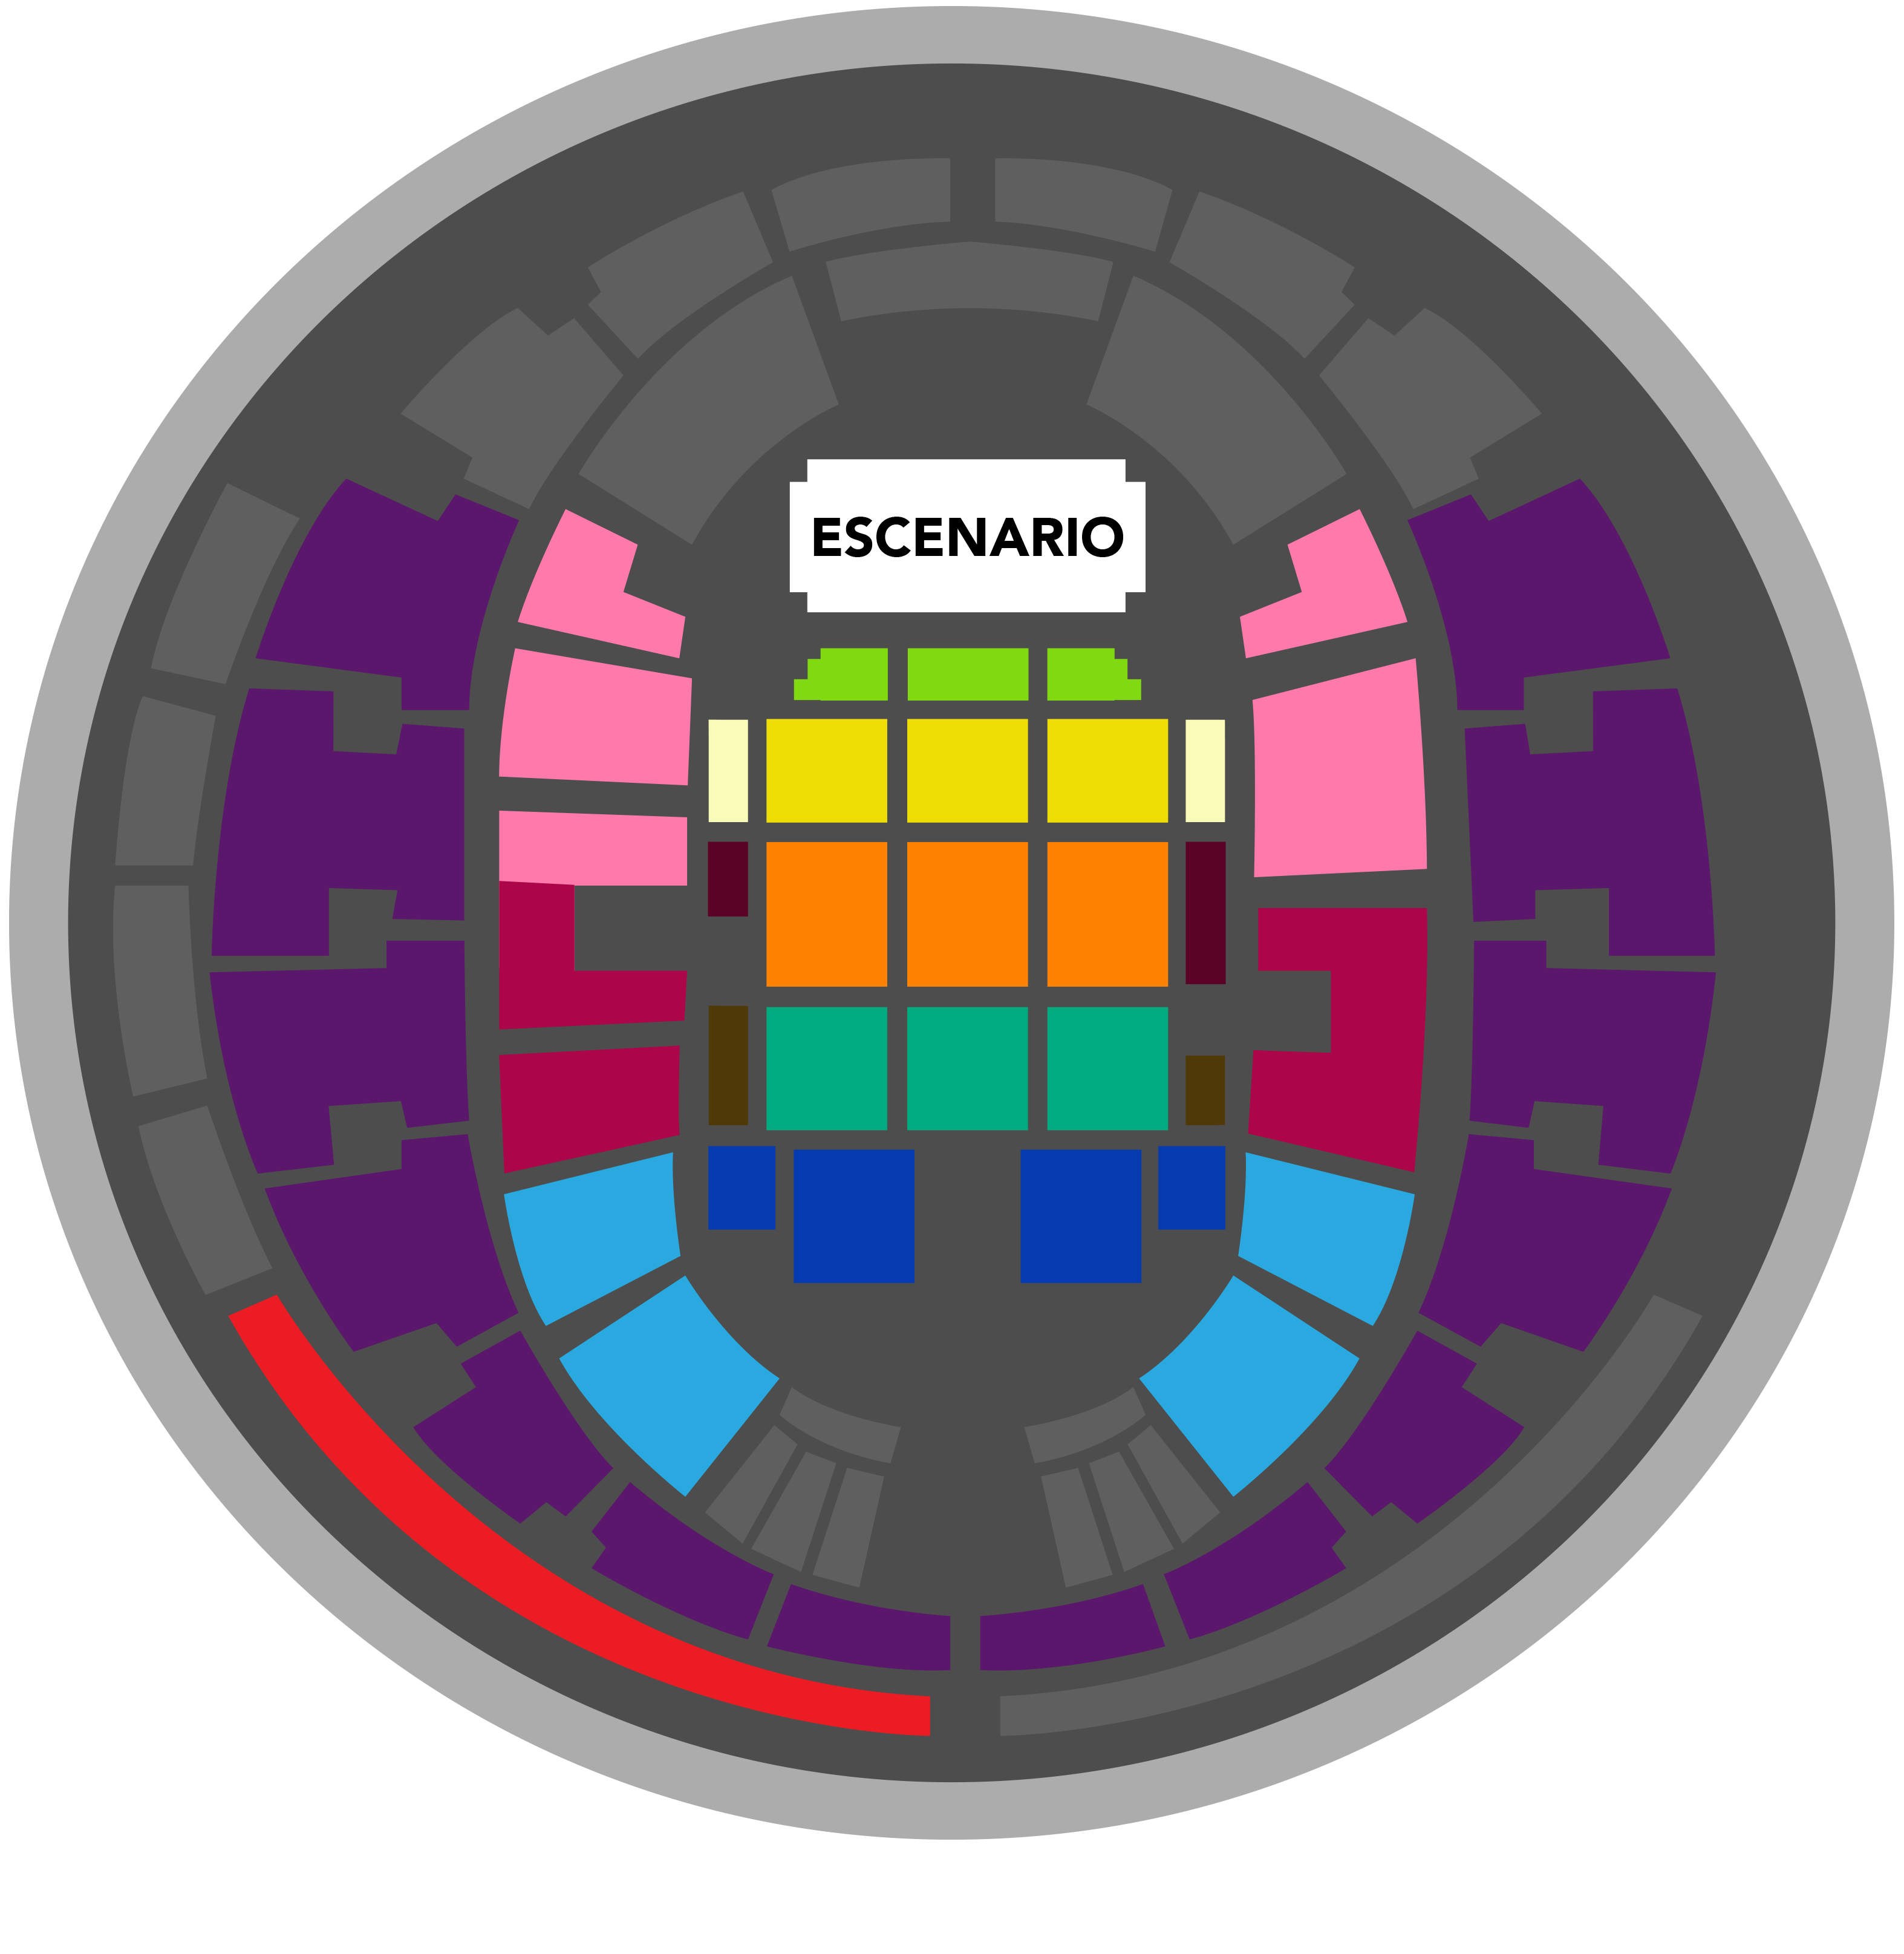 Movistar Arena - Mapa referencial sujeto a cambios